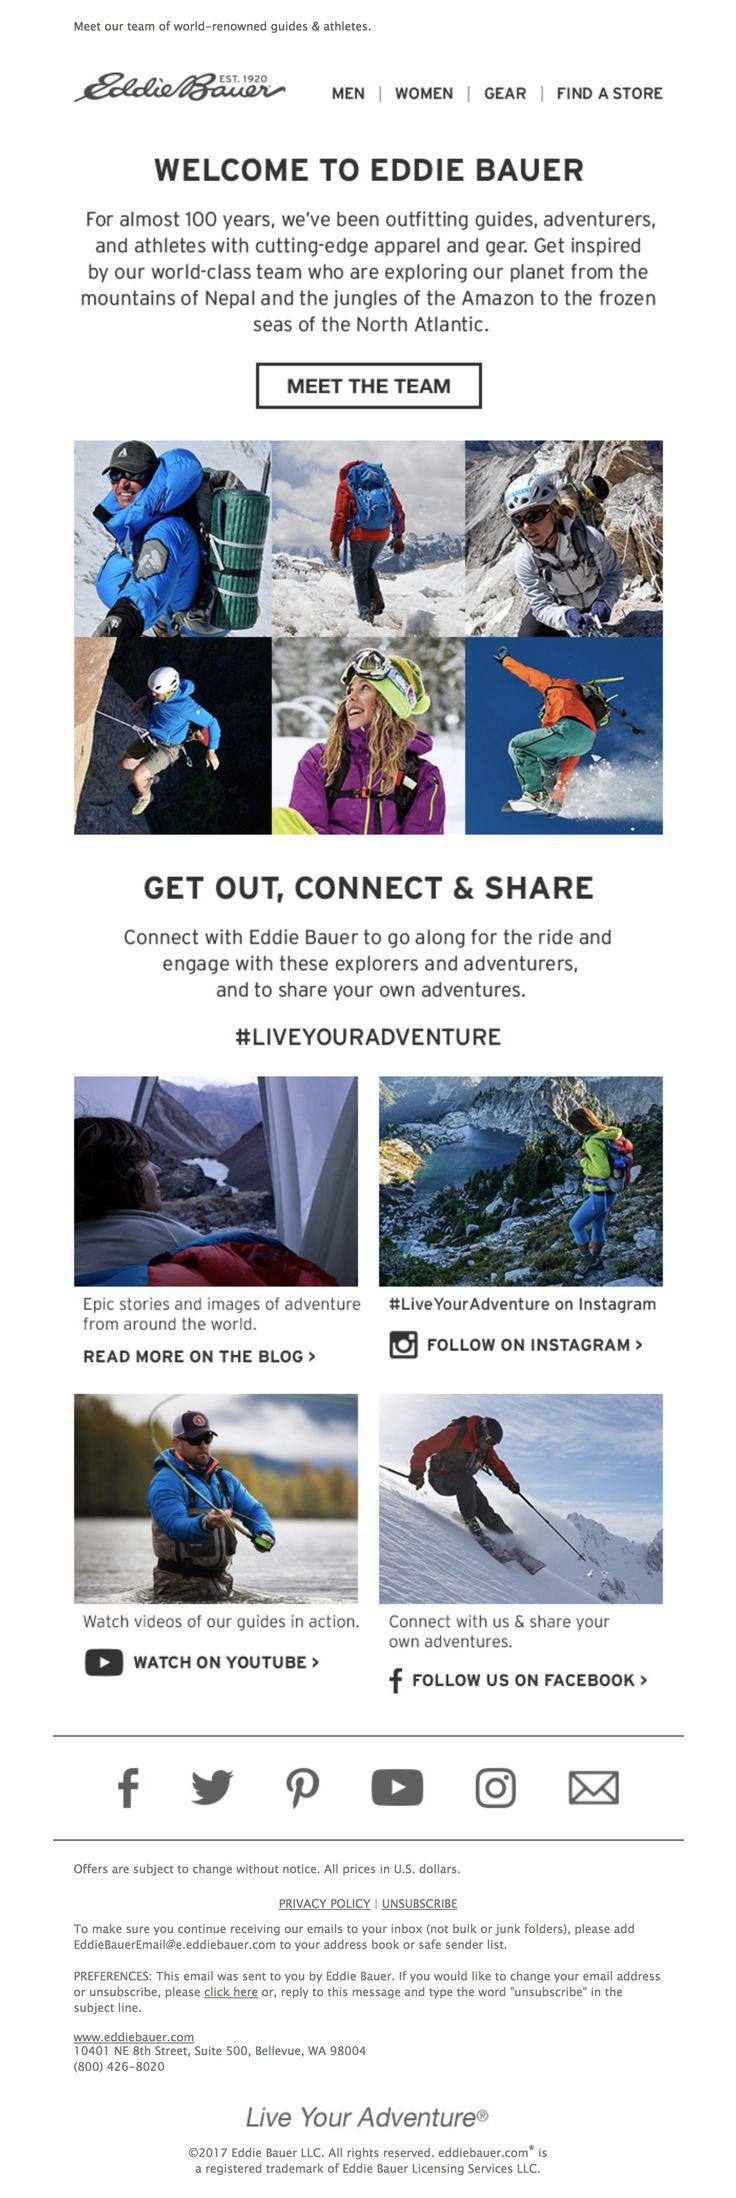 254 best Email Design Inspiration images on Pinterest | Email ...